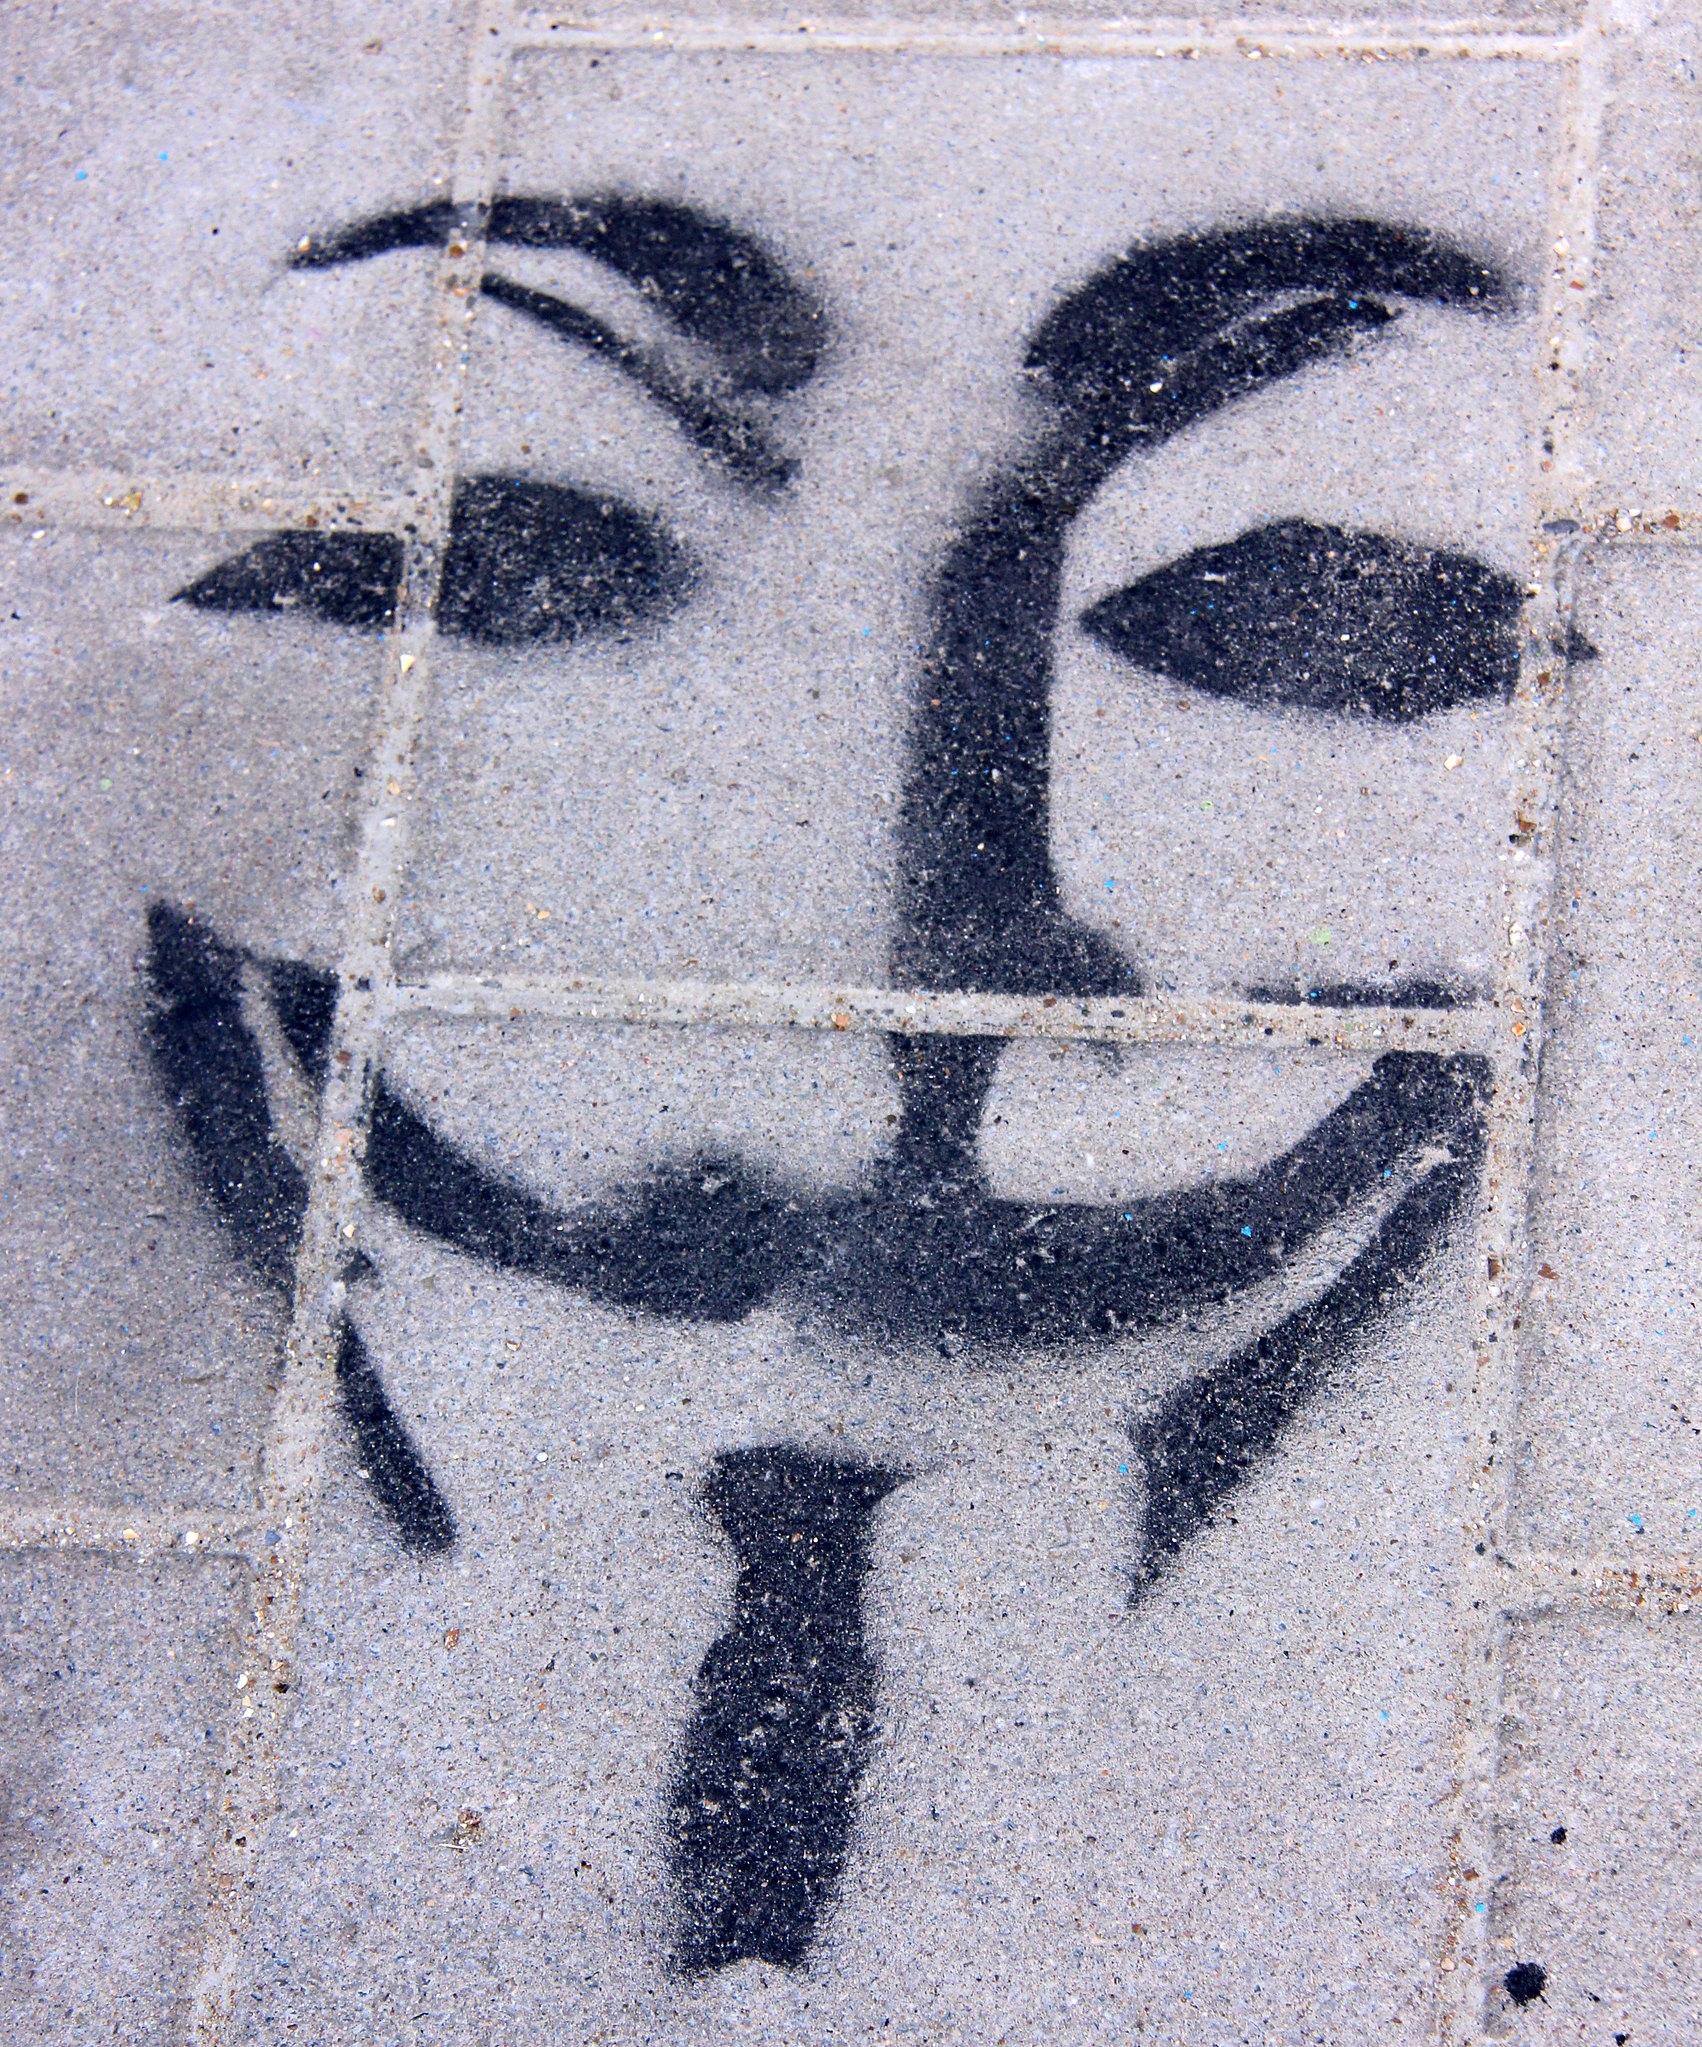 Pavement sprayed with Ghent street art